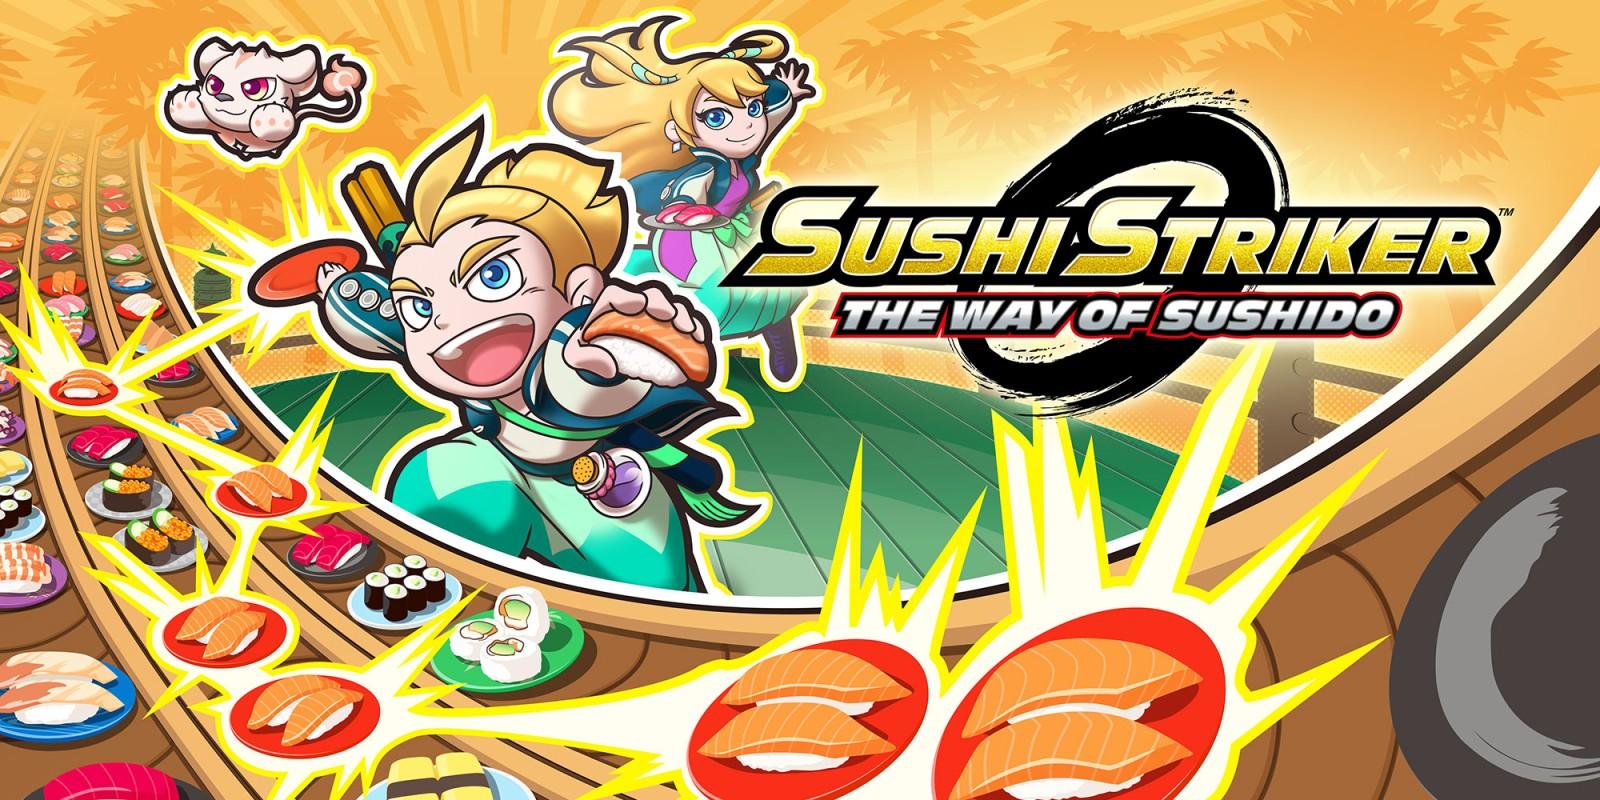 H2x1_3DS_SushiStrikerTheWayOfSushido_image1600w